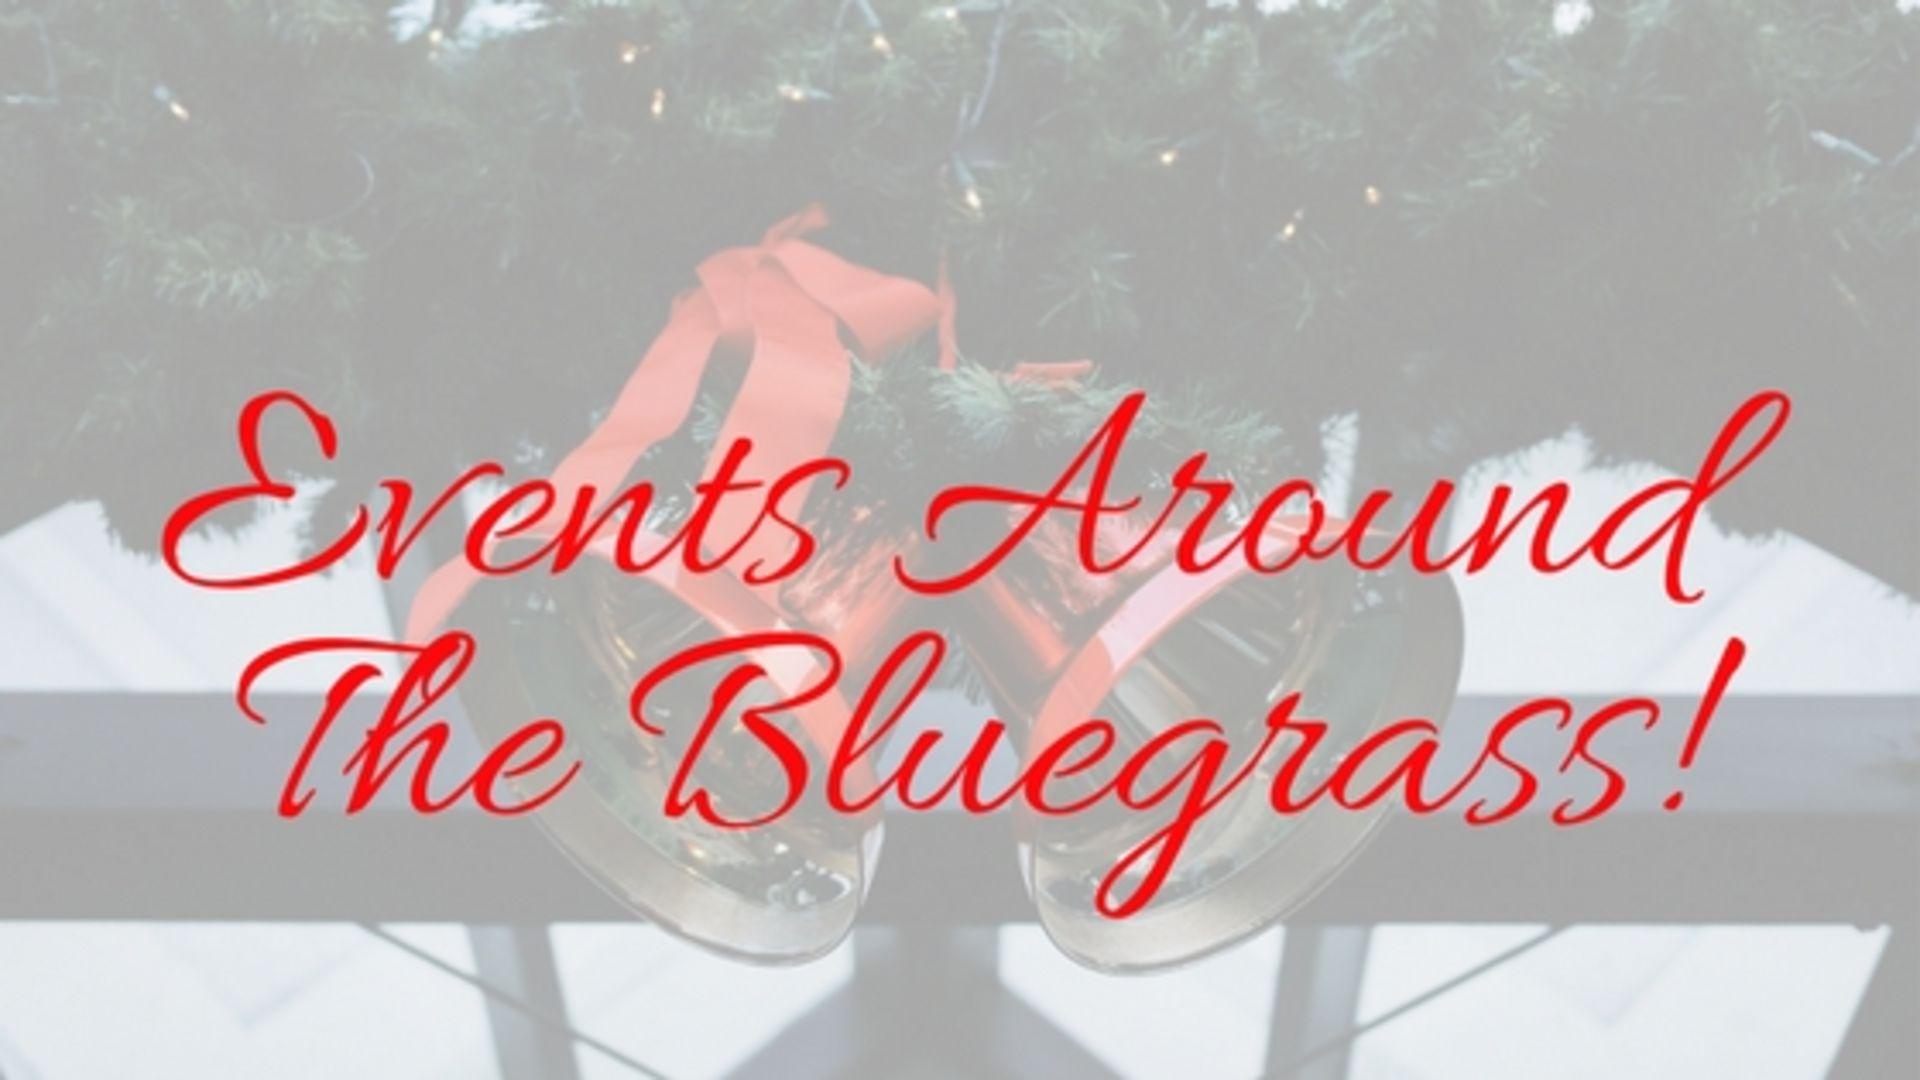 Events Around the Bluegrass!